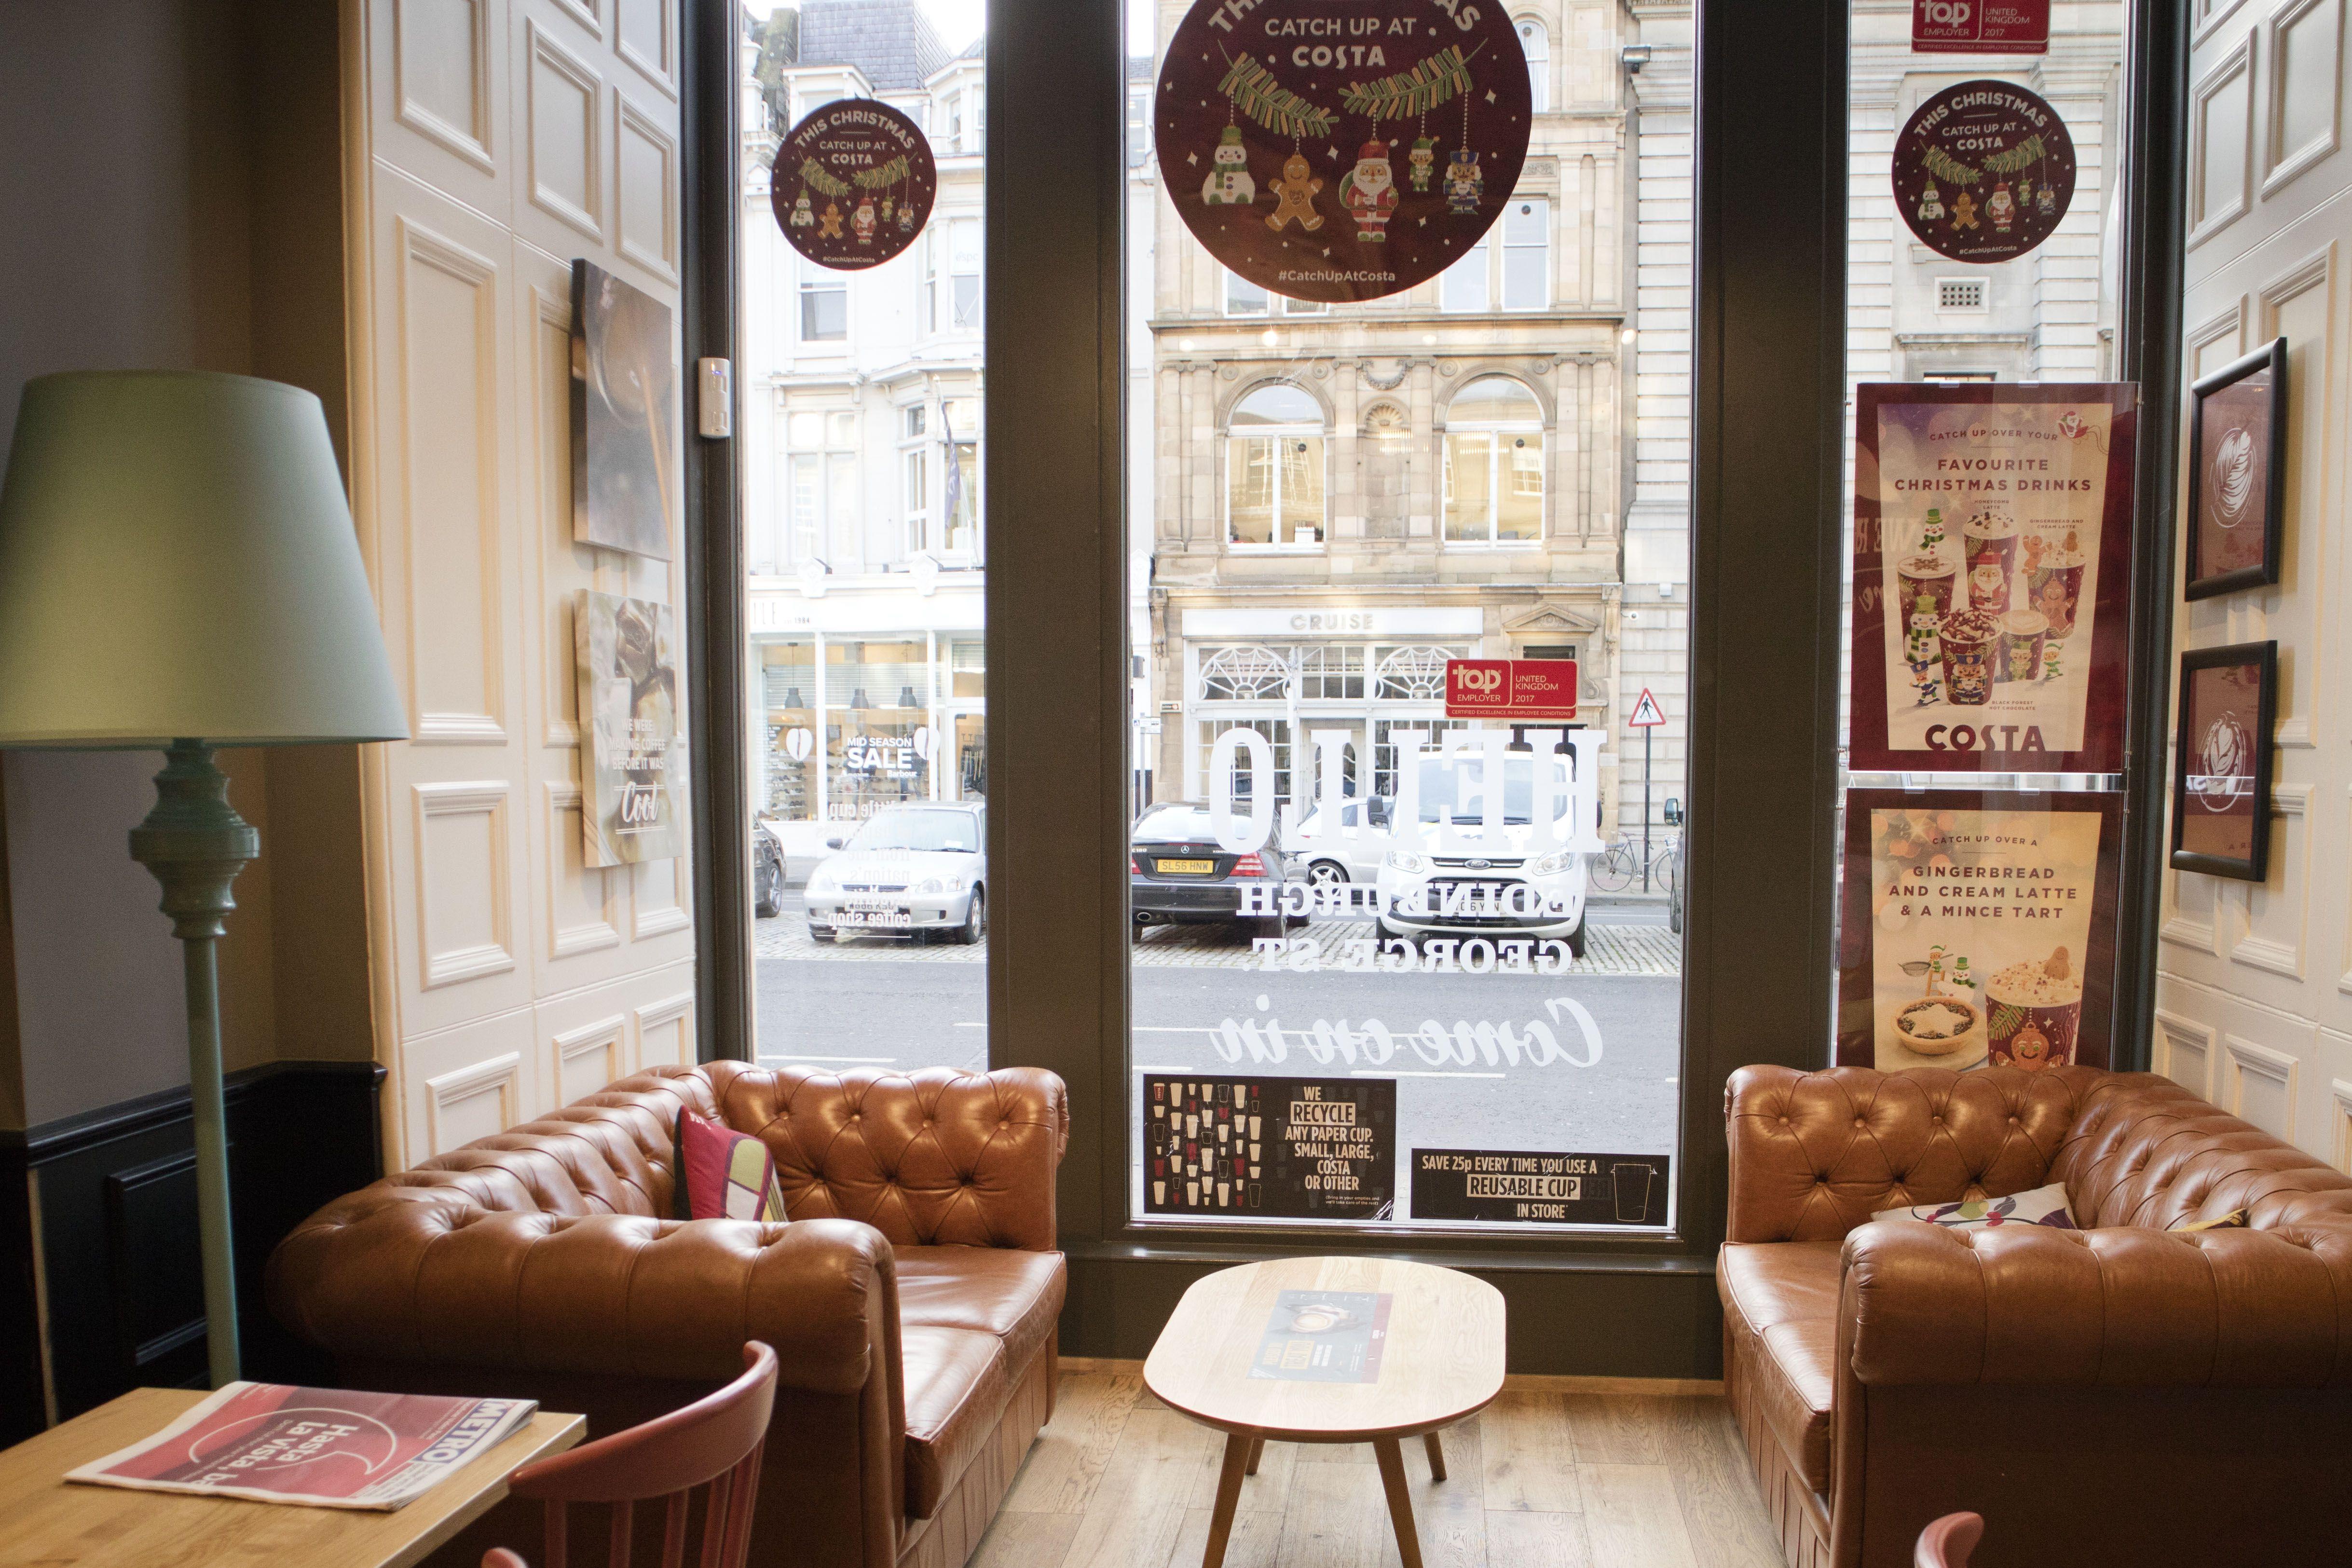 Chesterfield Sofas Edinburgh George Street Costa Coffee By